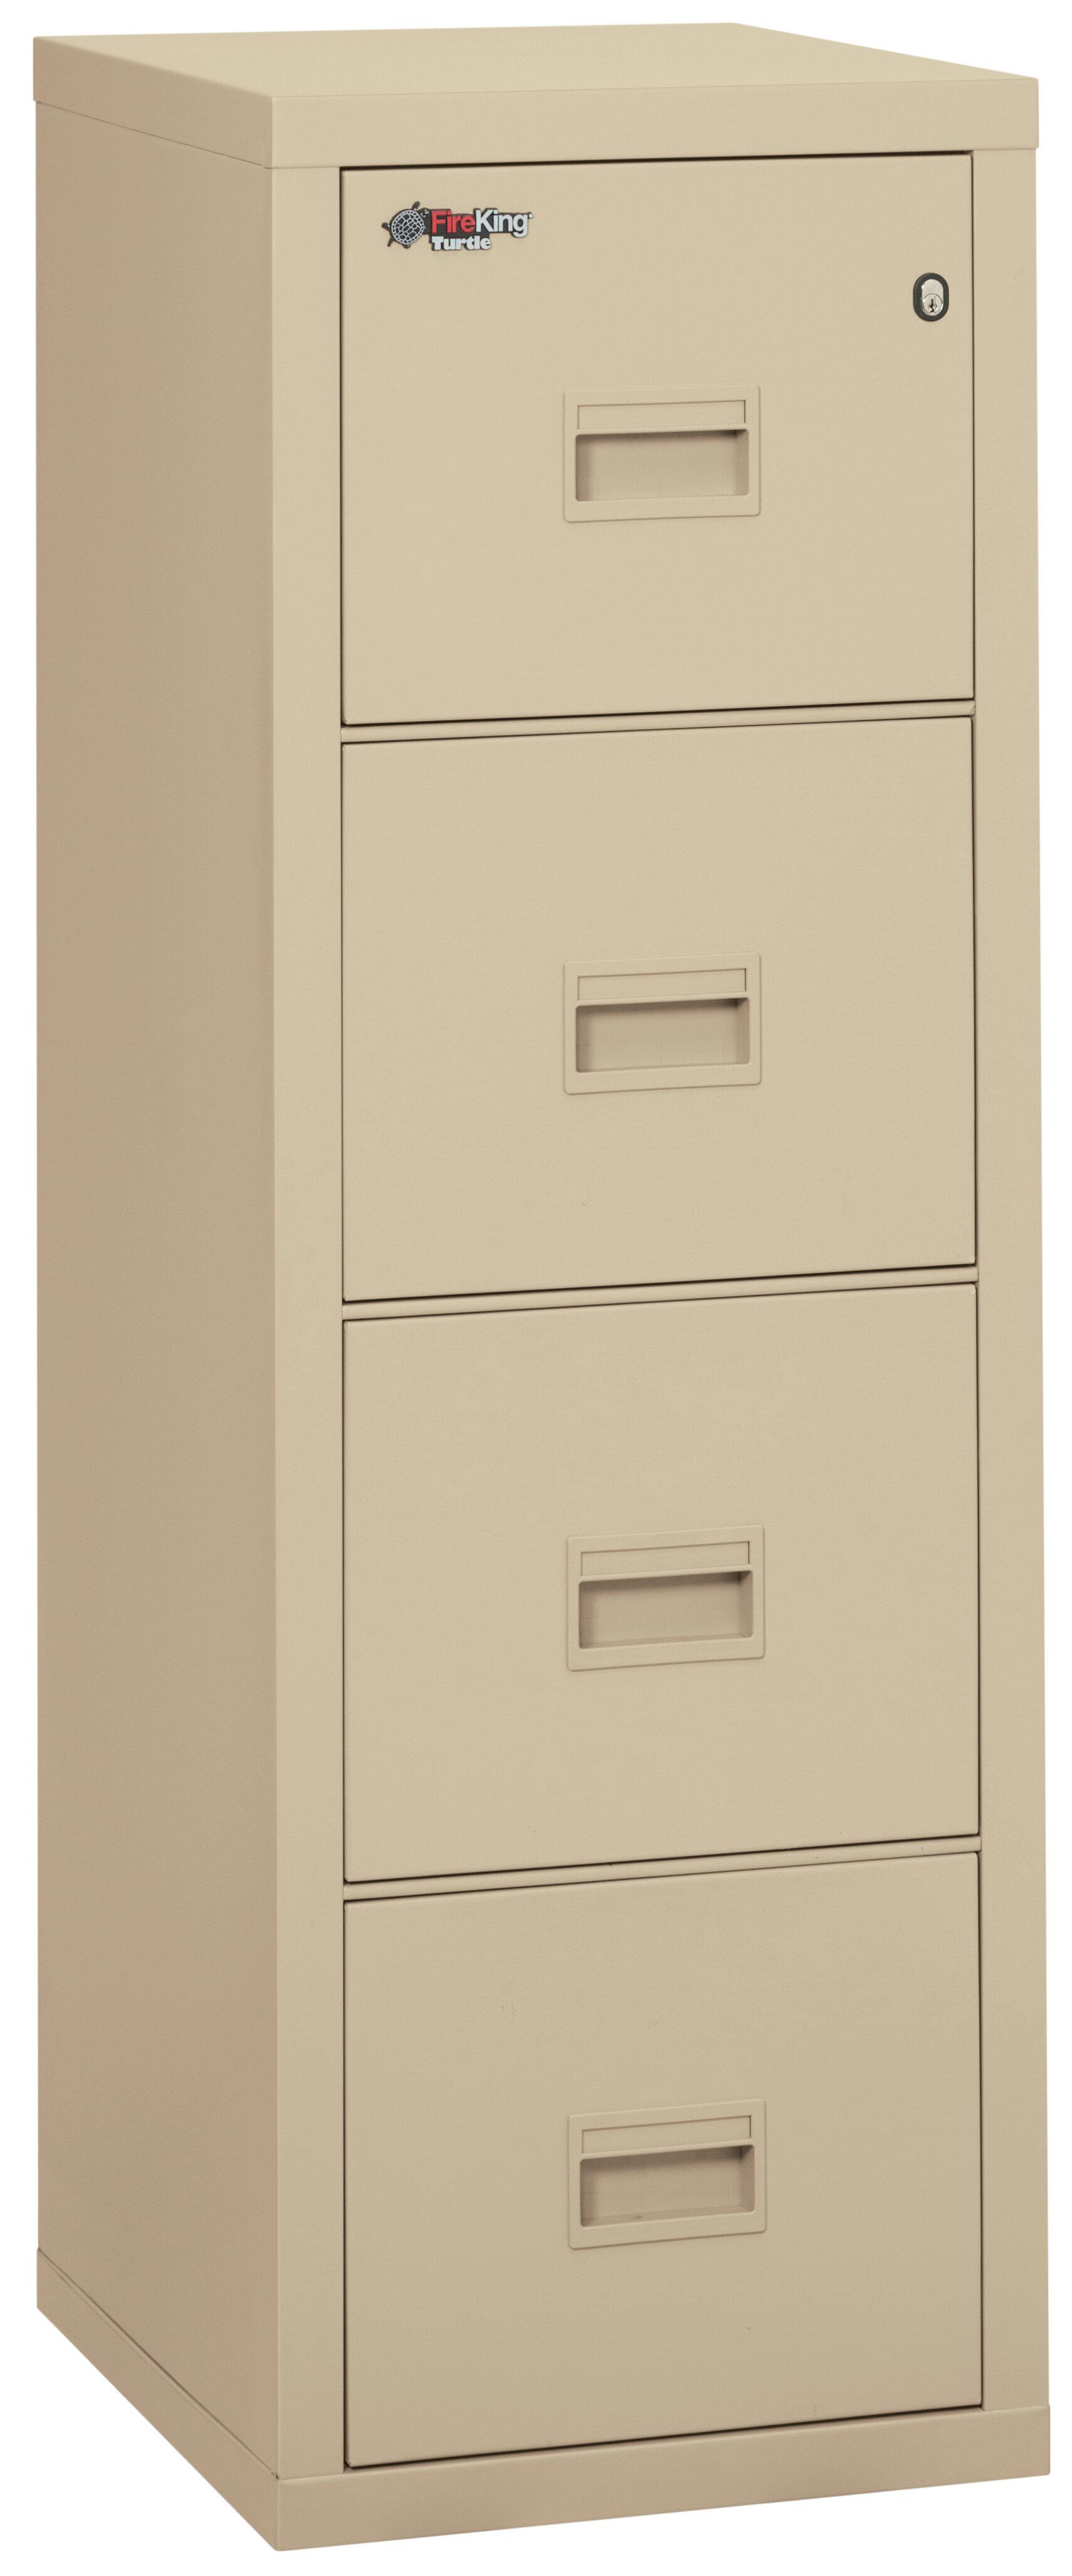 Ordinaire FireKing Turtle Fireproof 4 Drawer Vertical File Cabinet U0026 Reviews   Wayfair